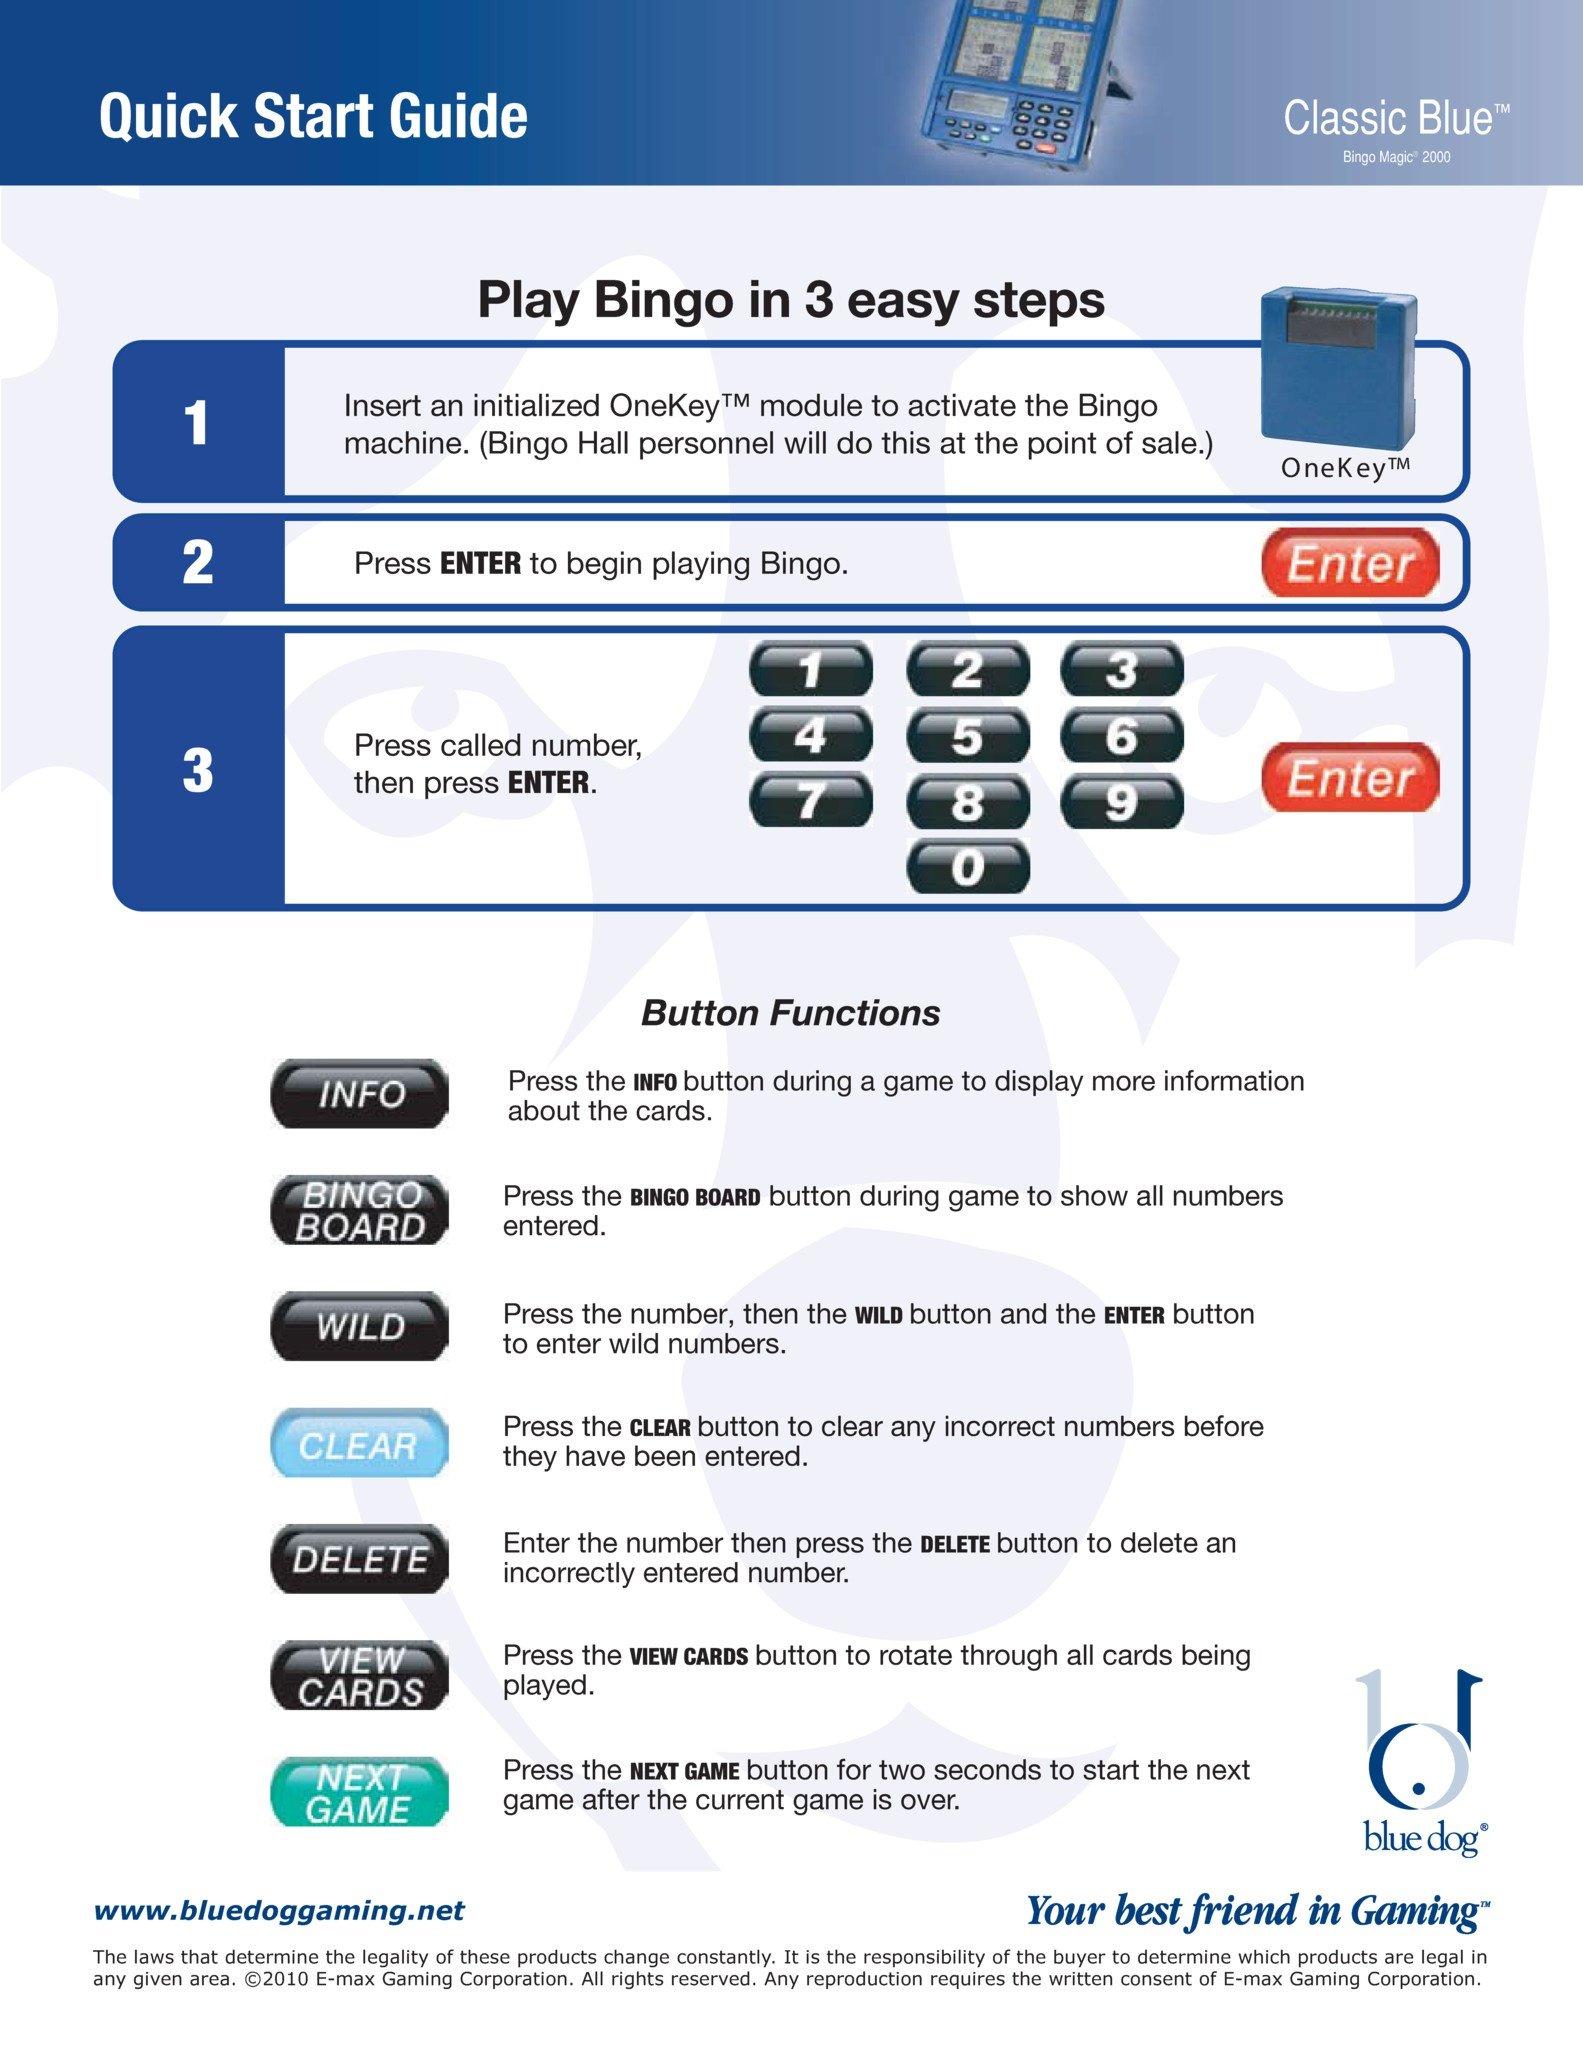 Classic Blue Quick Start Guide Equipment Manuals/Quick Start Guides